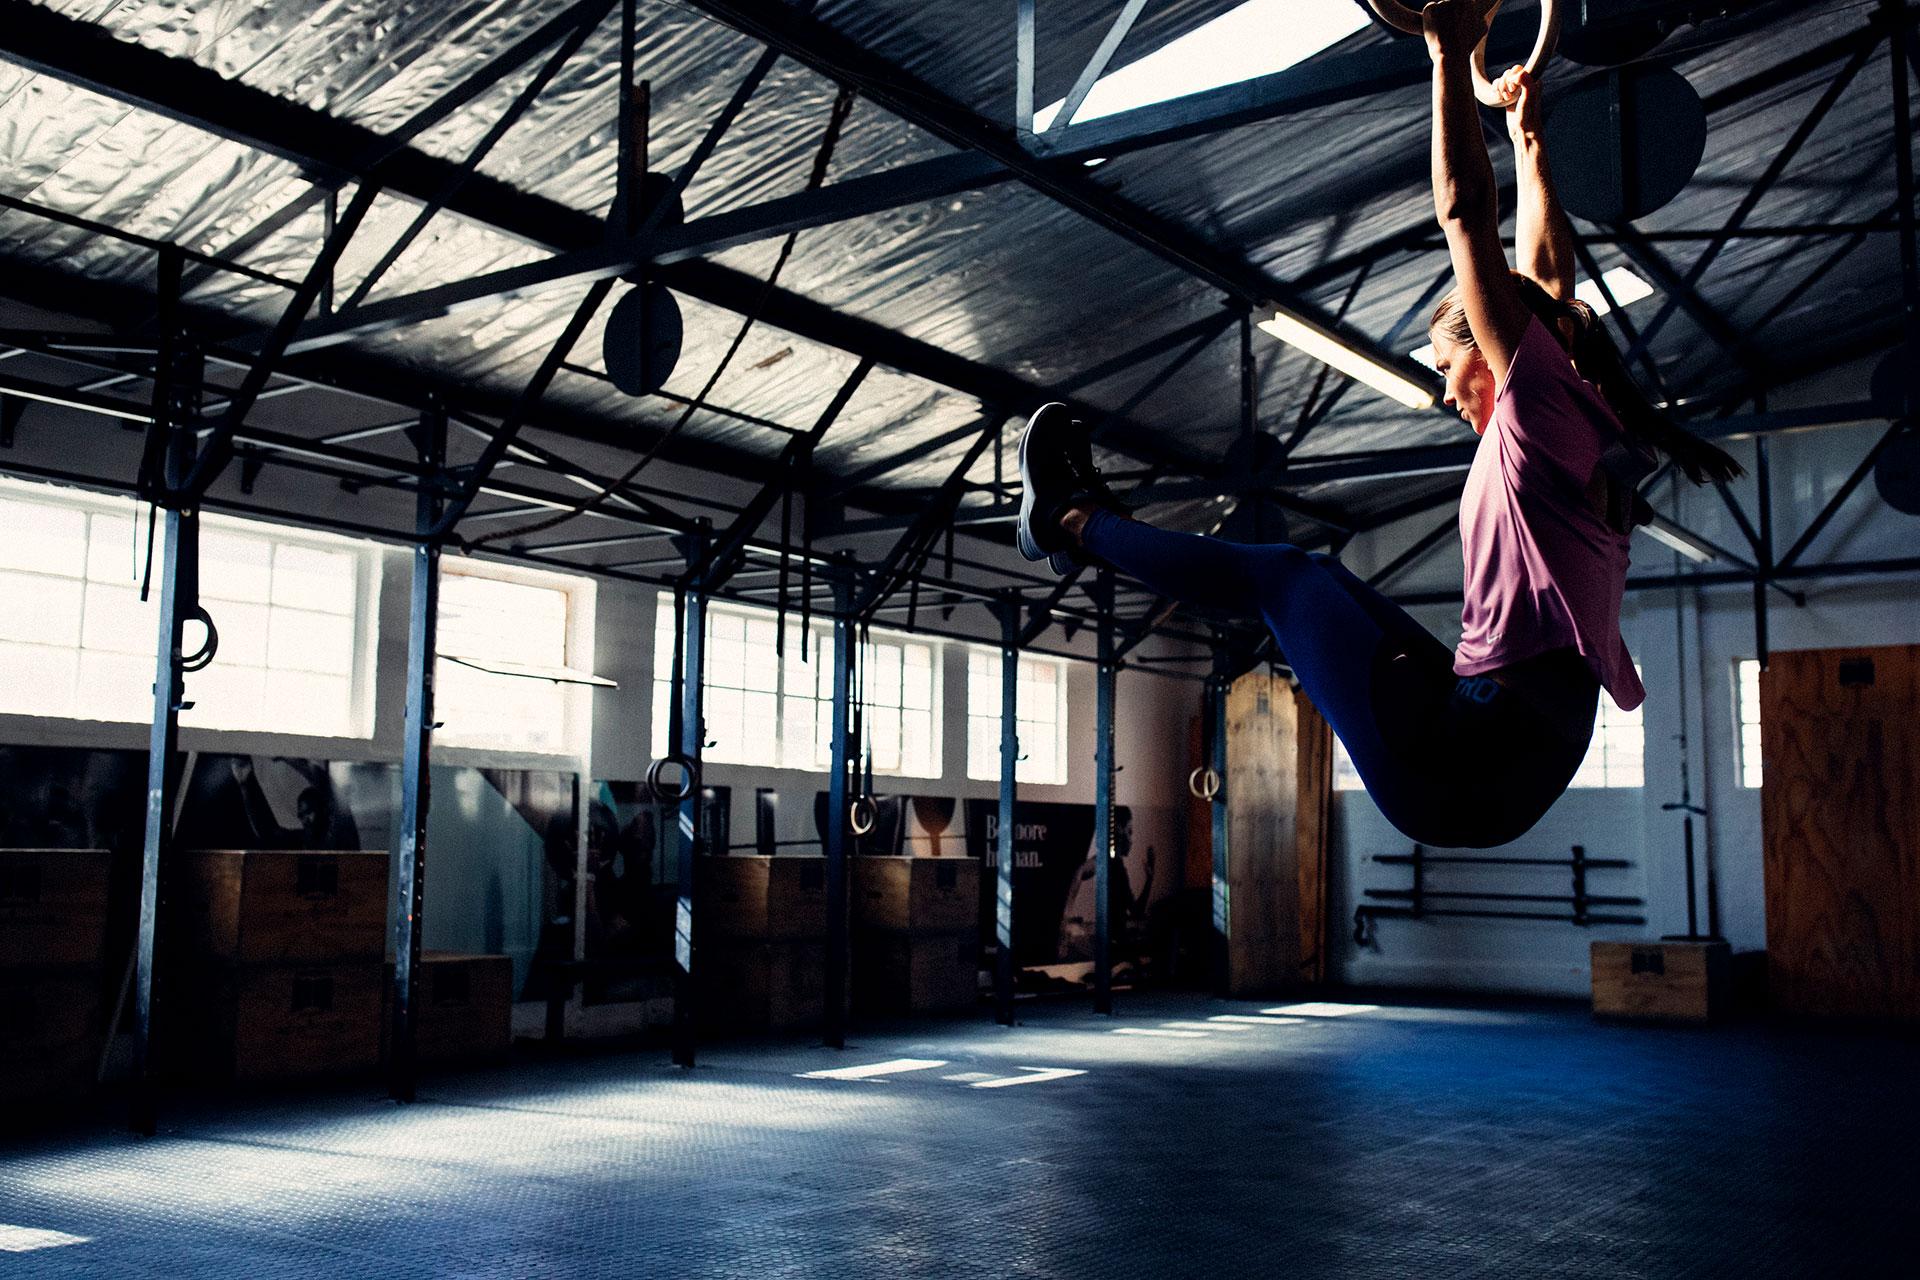 Fotografie Schweiß Training Fitness Studio Crossfit Kapstadt Südafrika